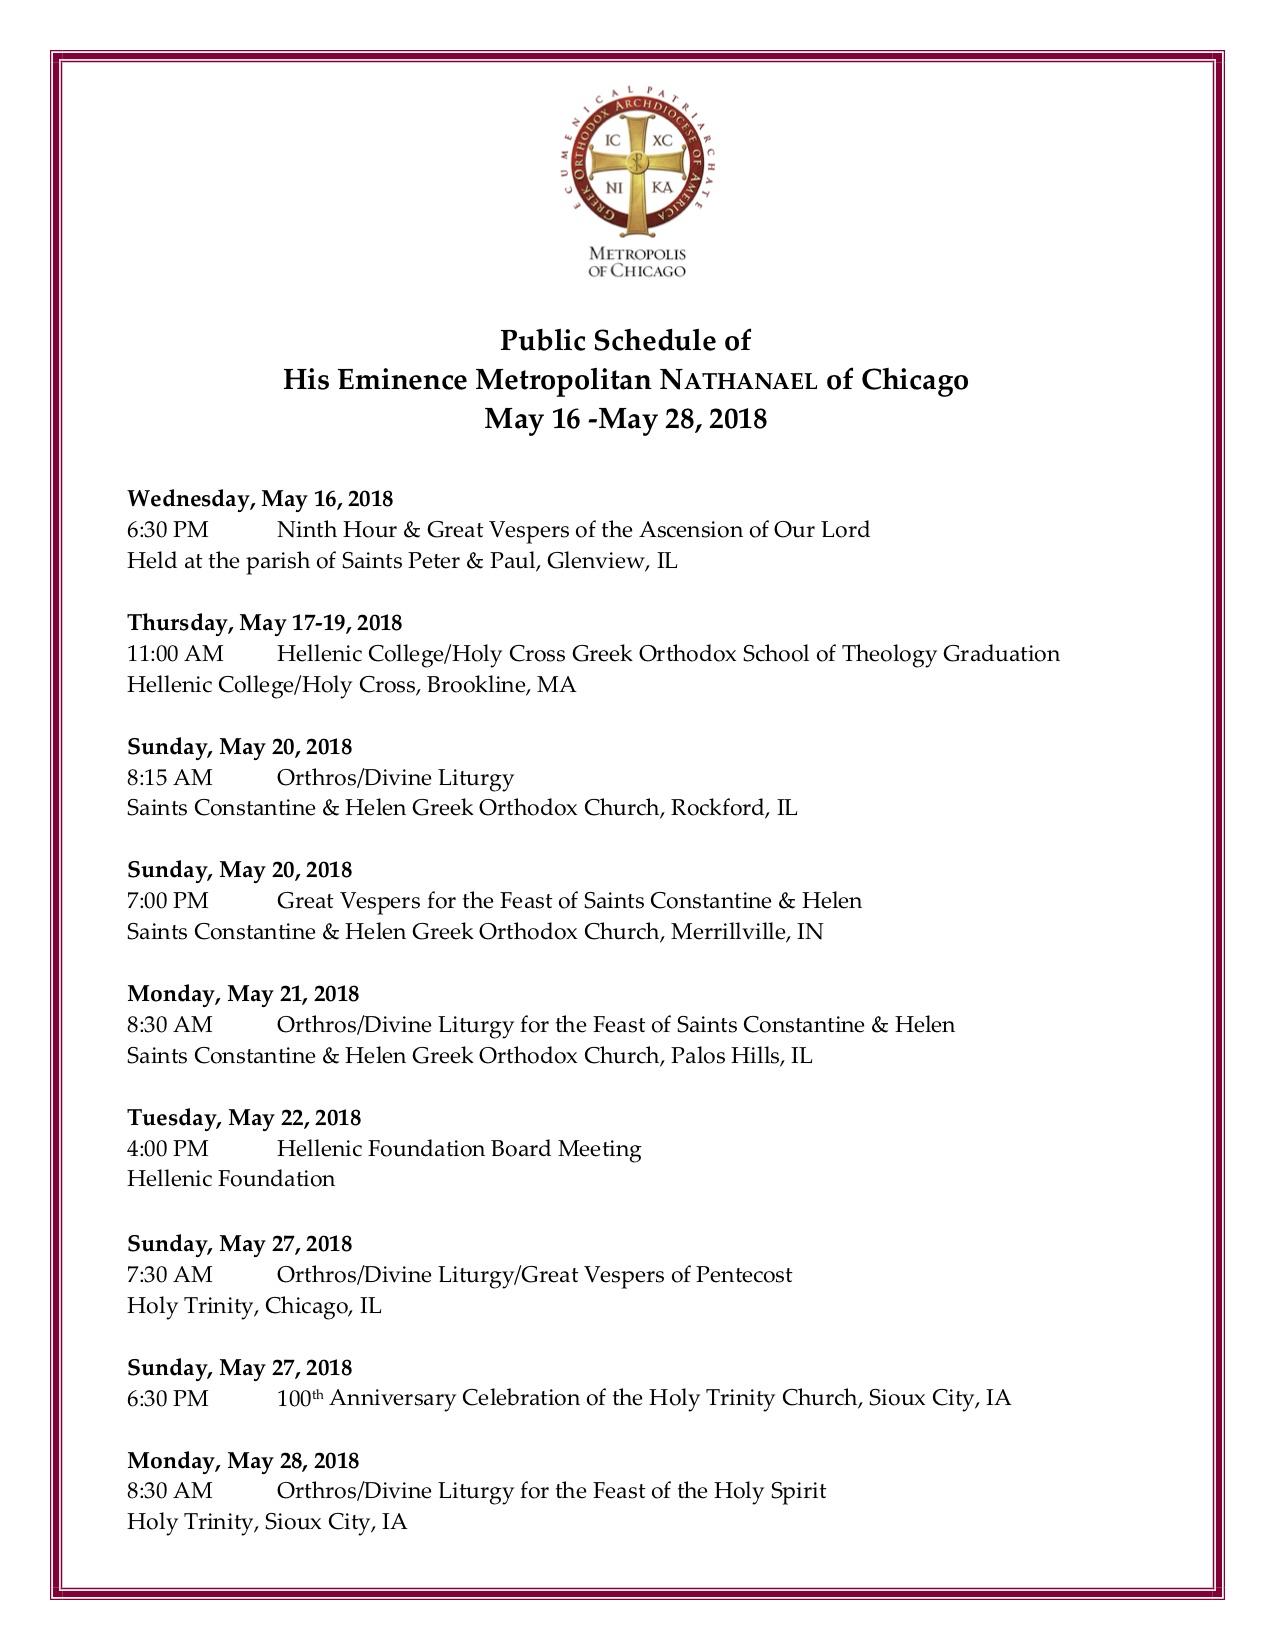 May 16-22 2018 Schedule MN.jpg